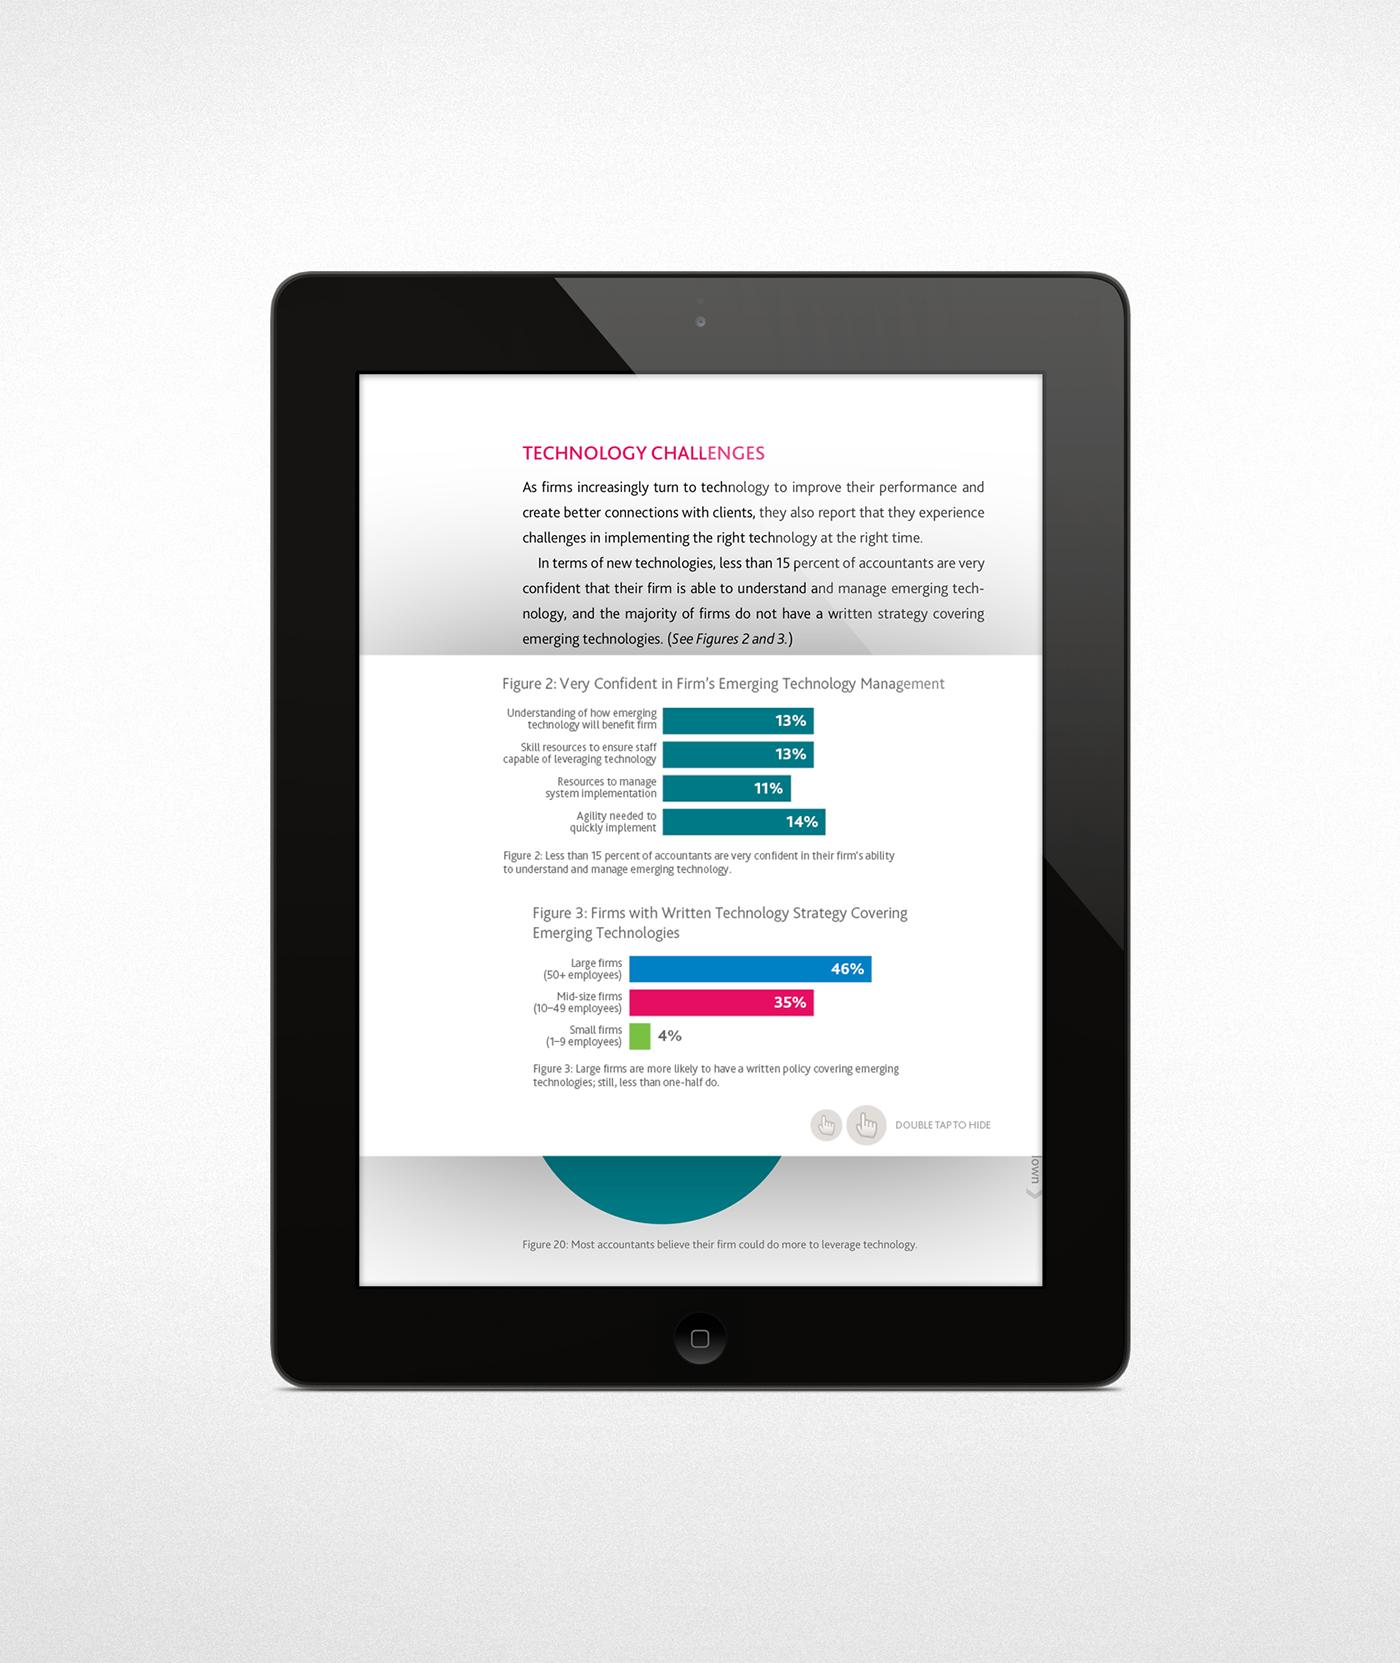 Adobe DPS digital publishing suite